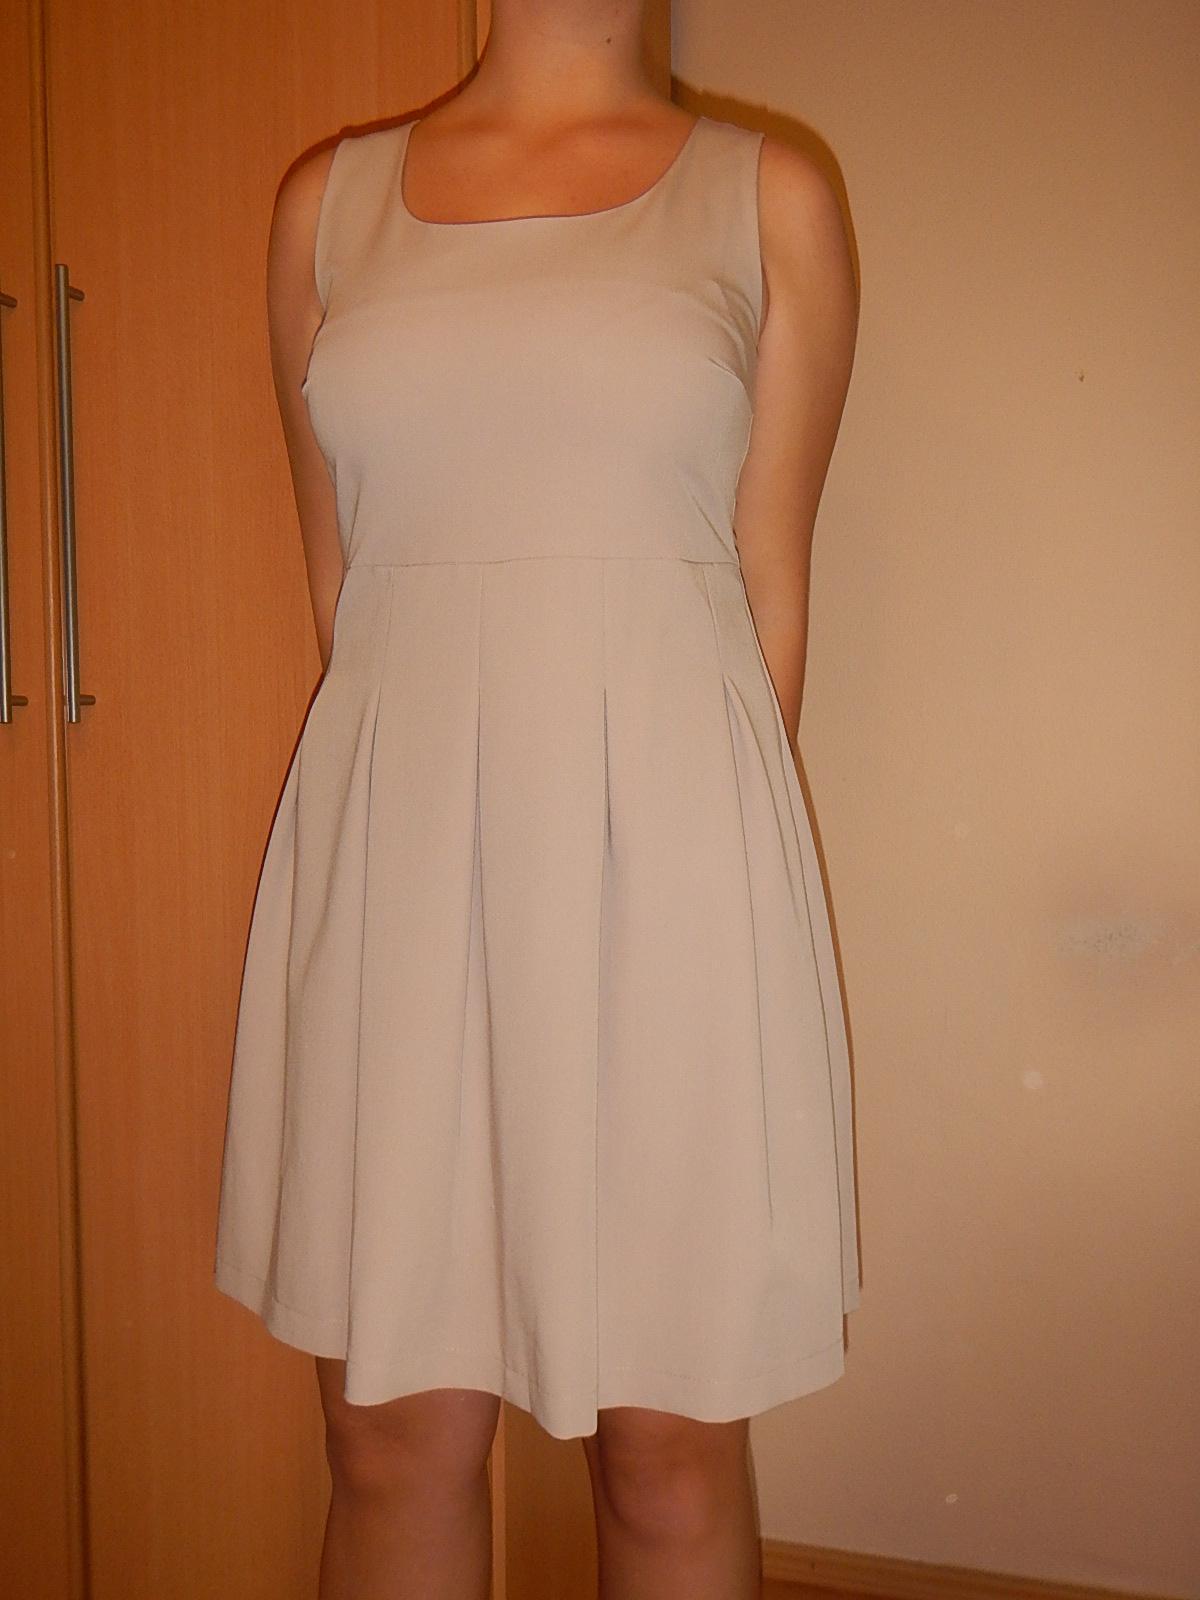 Koktailové šaty - Obrázok č. 2